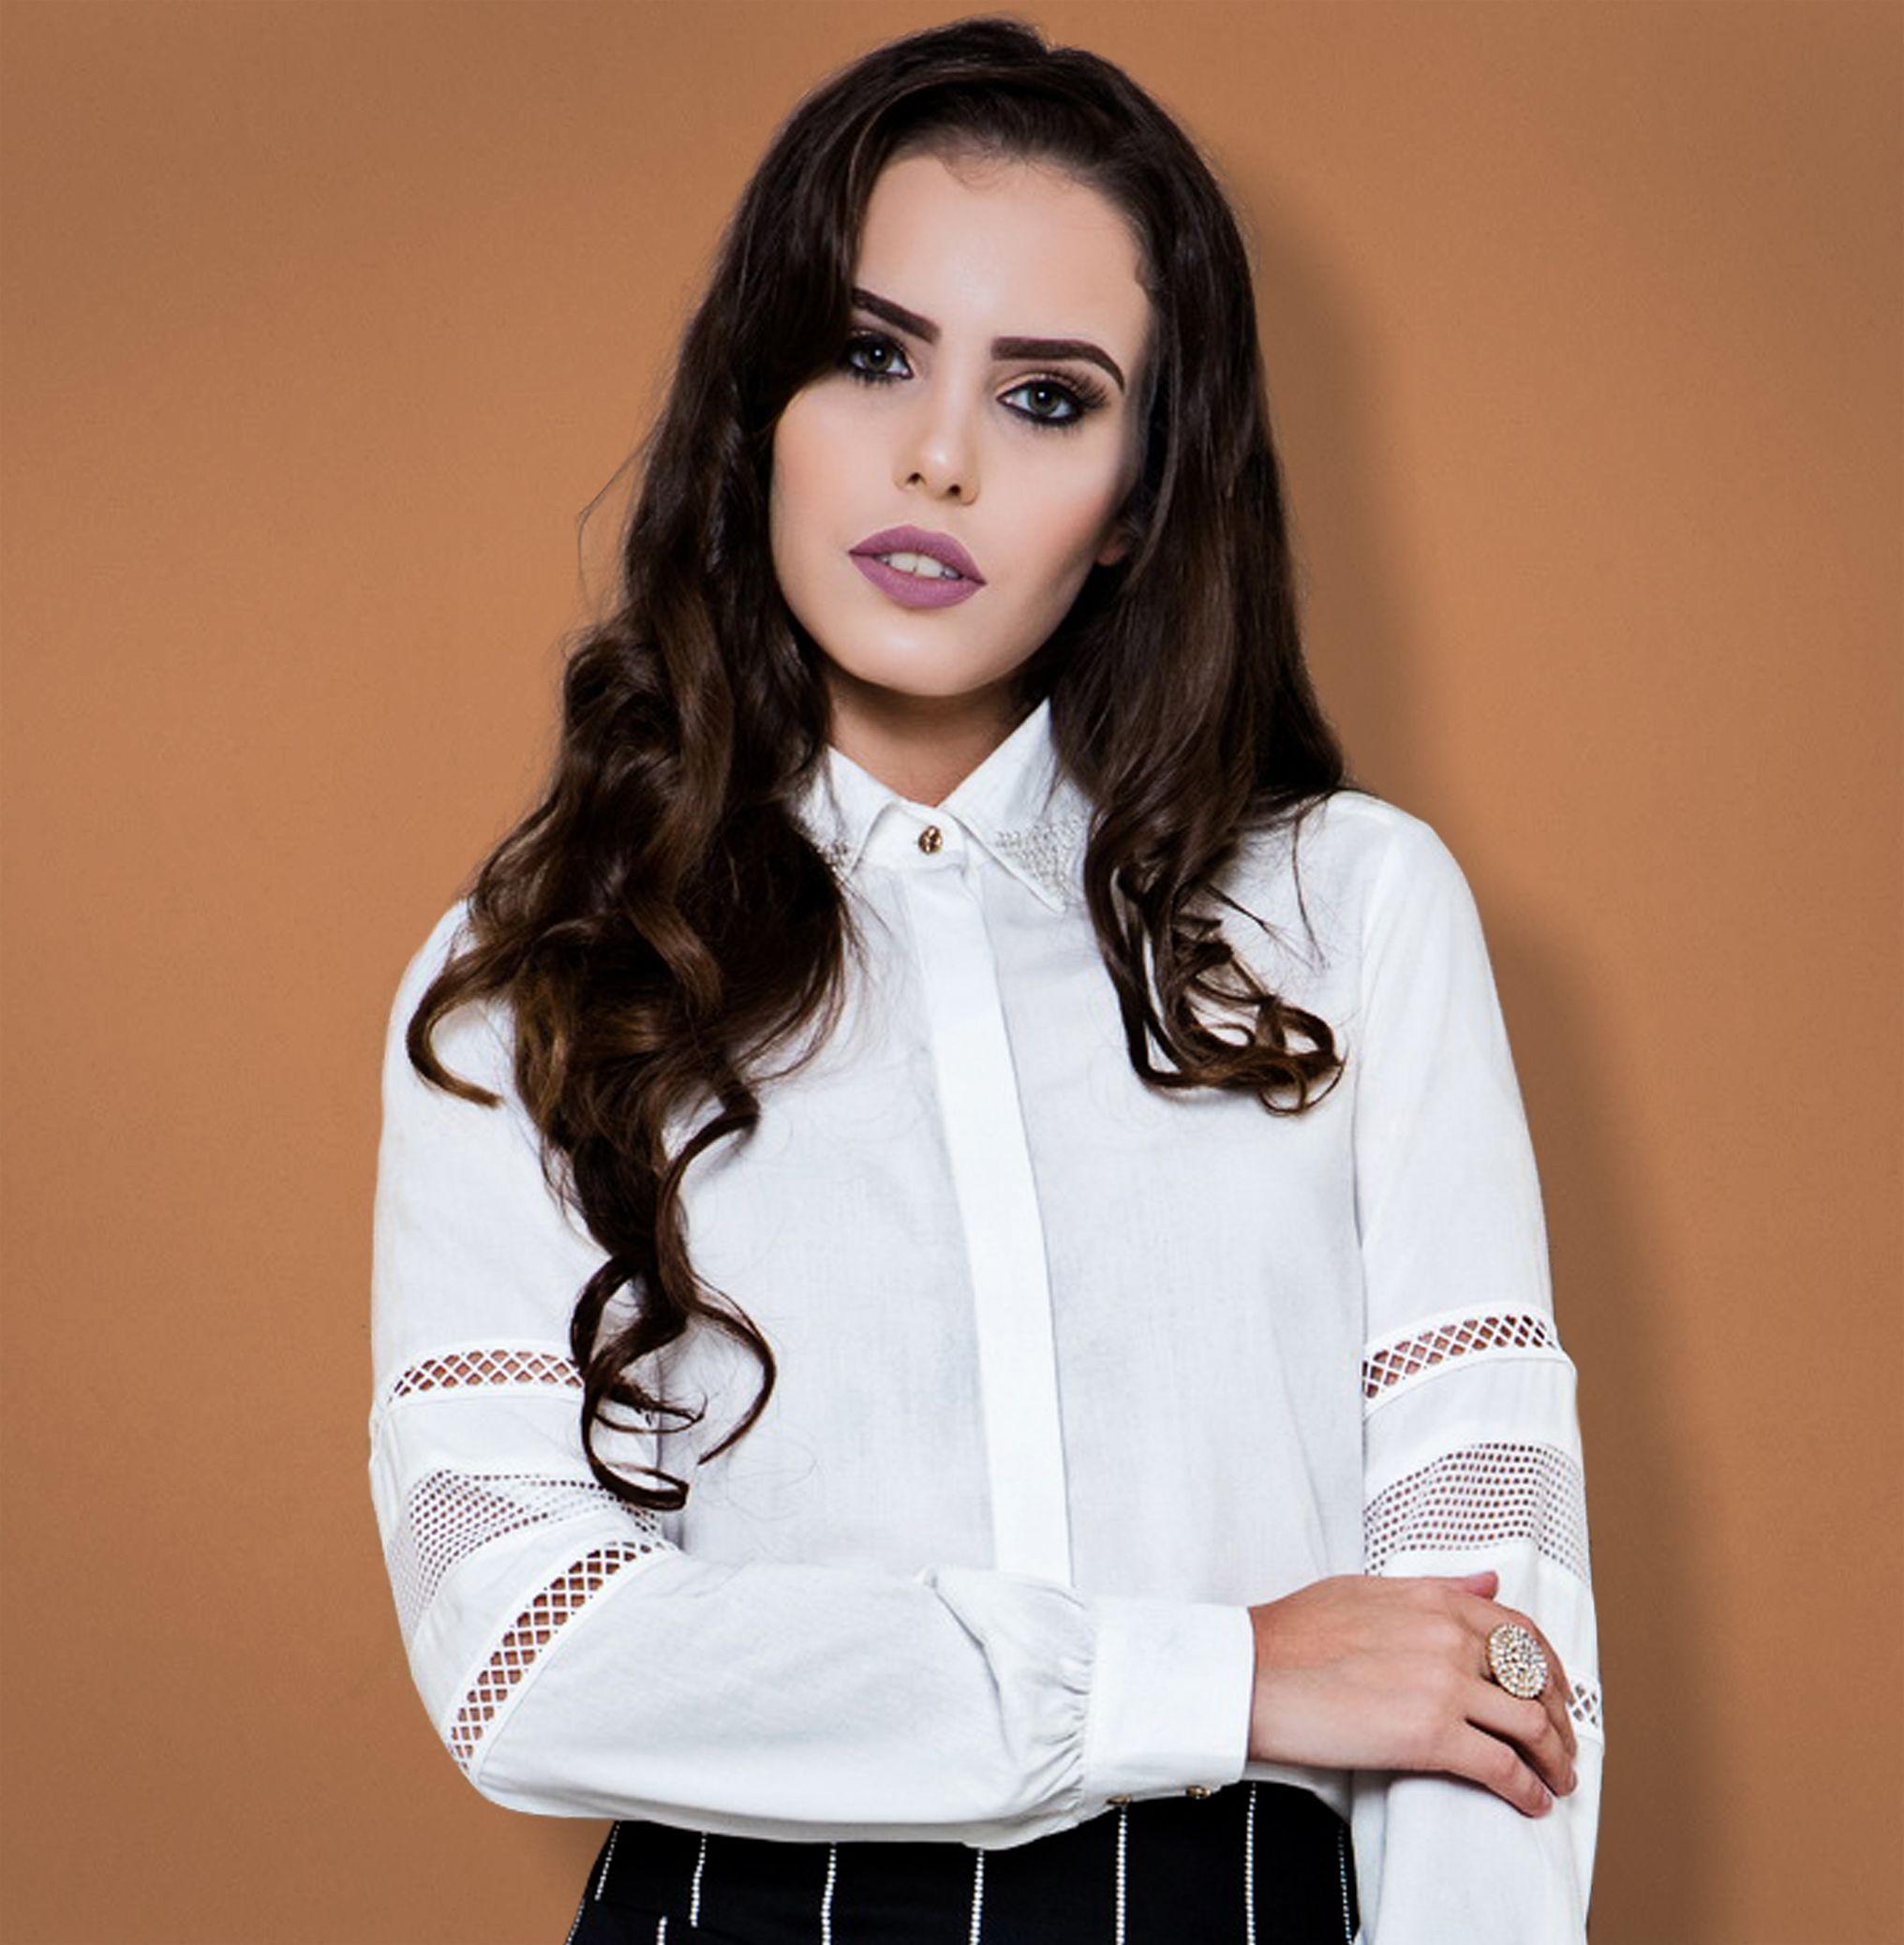 799917780a Camisa feminina branca com recortes de tela